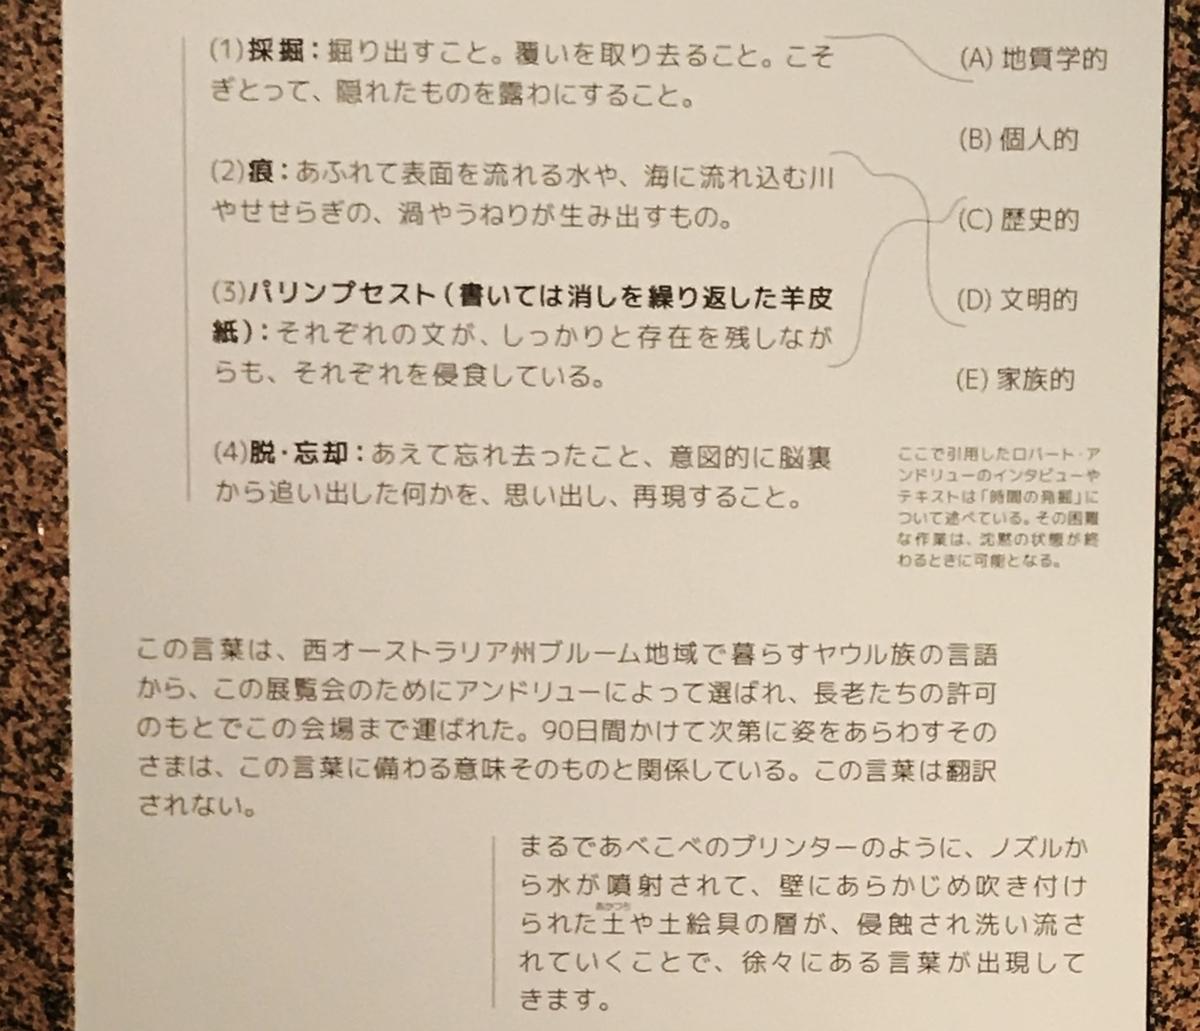 f:id:ryuuzanshi:20200918142142j:plain